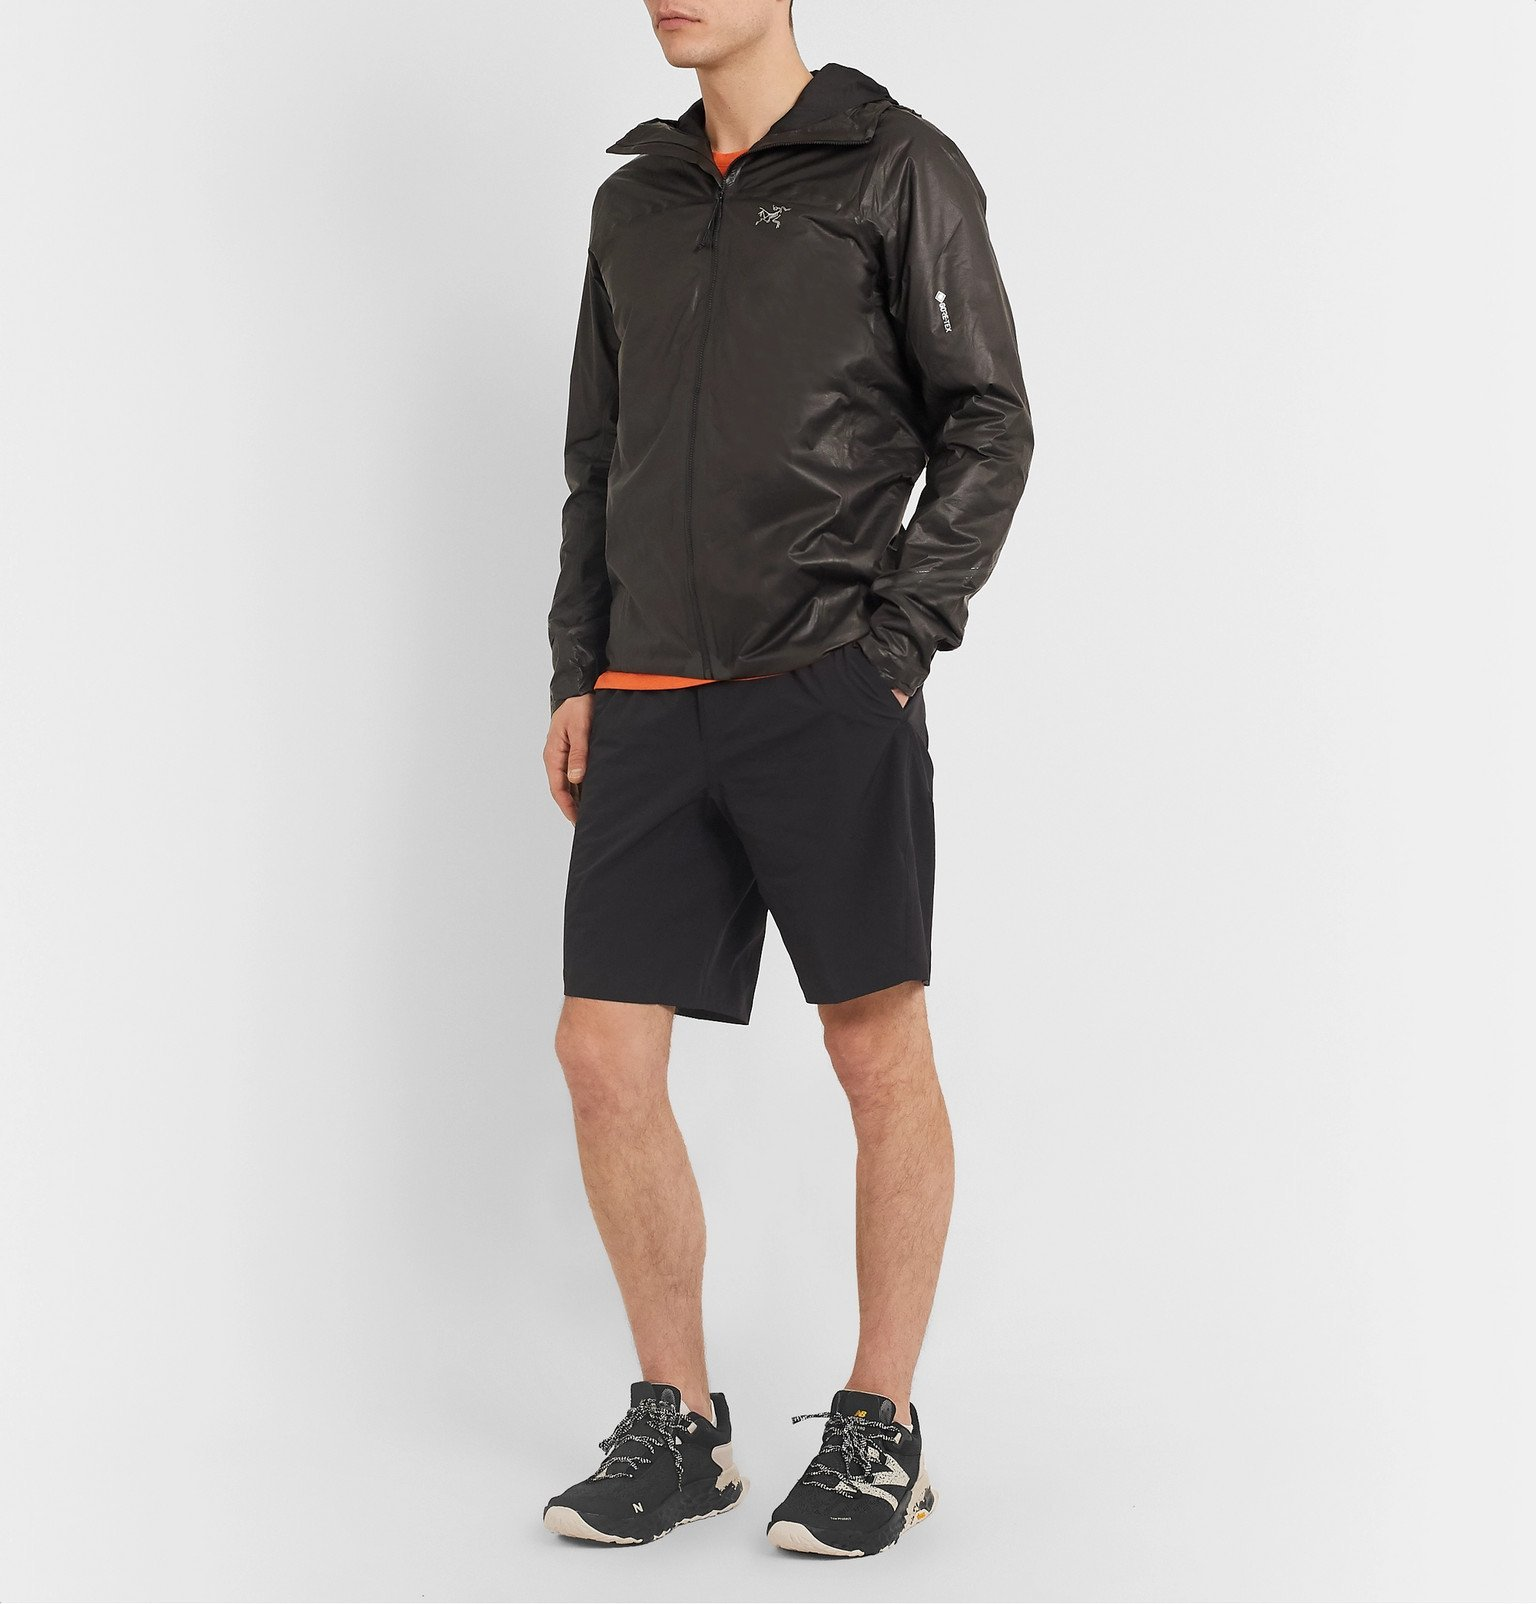 New Balance - Trail Heirro V5 Rubber-Trimmed Mesh Running Sneakers - Black